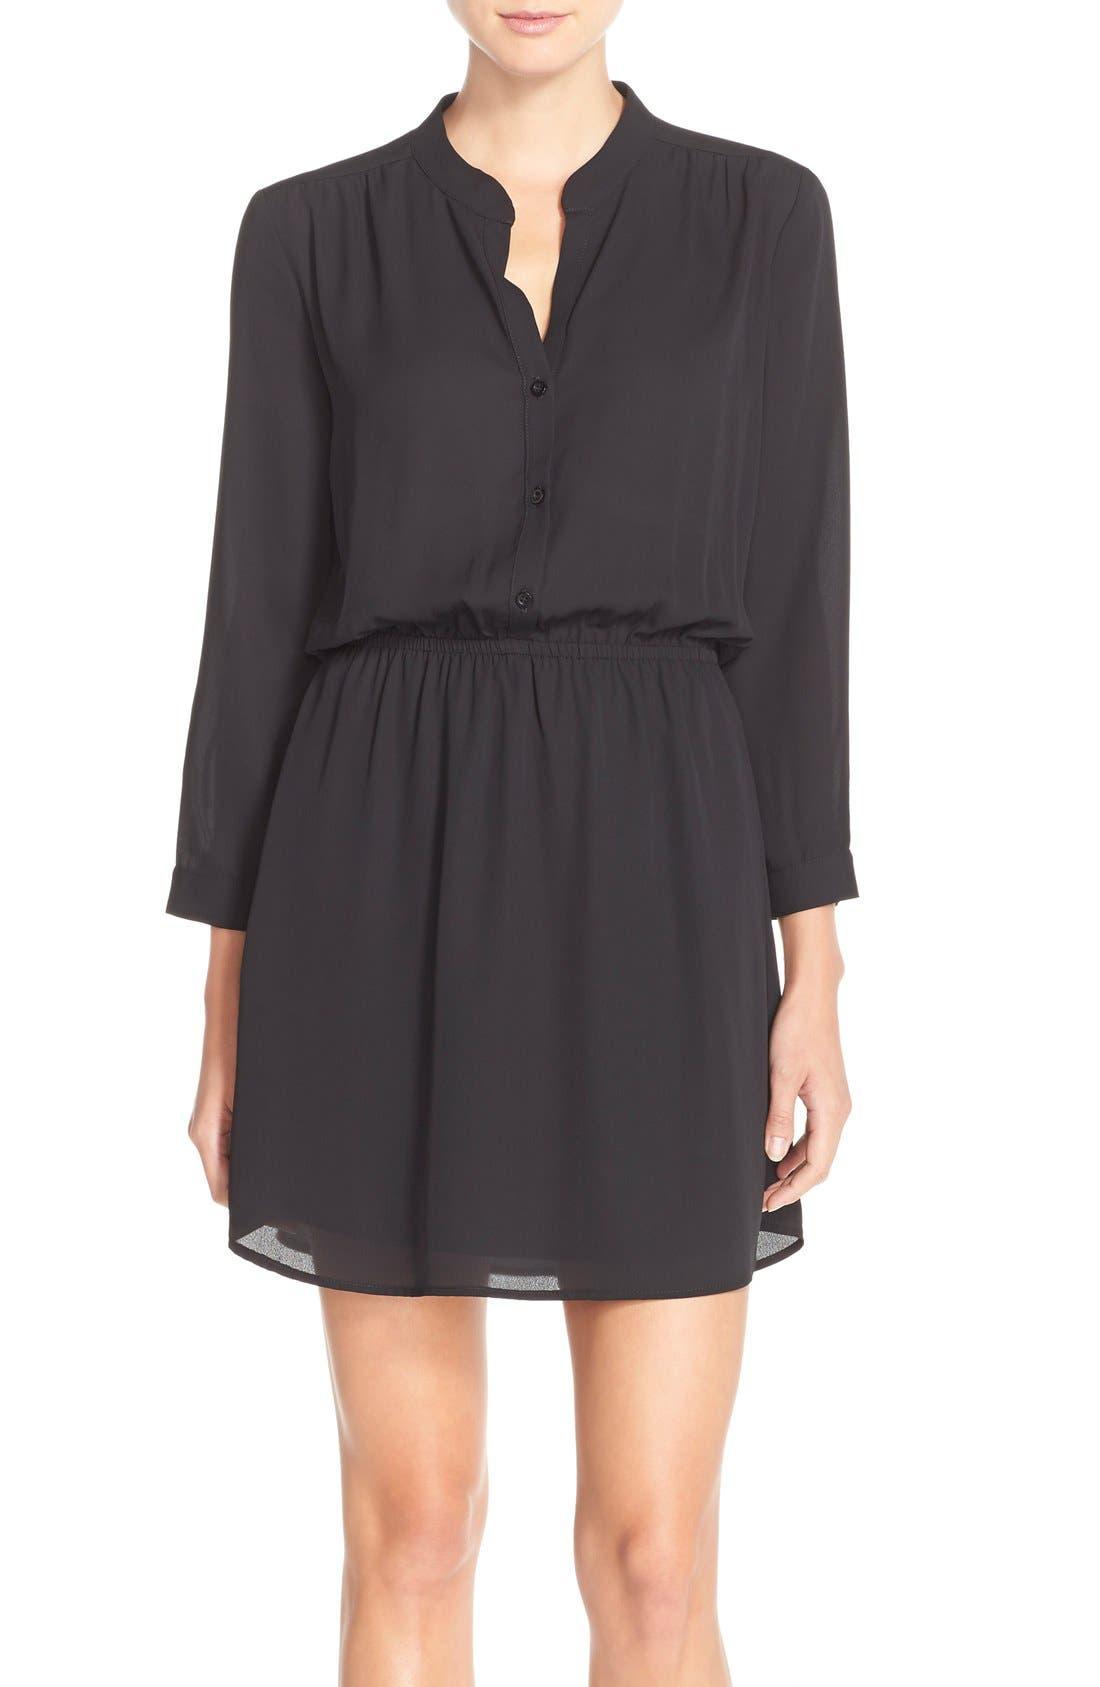 CHARLES HENRY Crepe Shirtdress, Main, color, 001